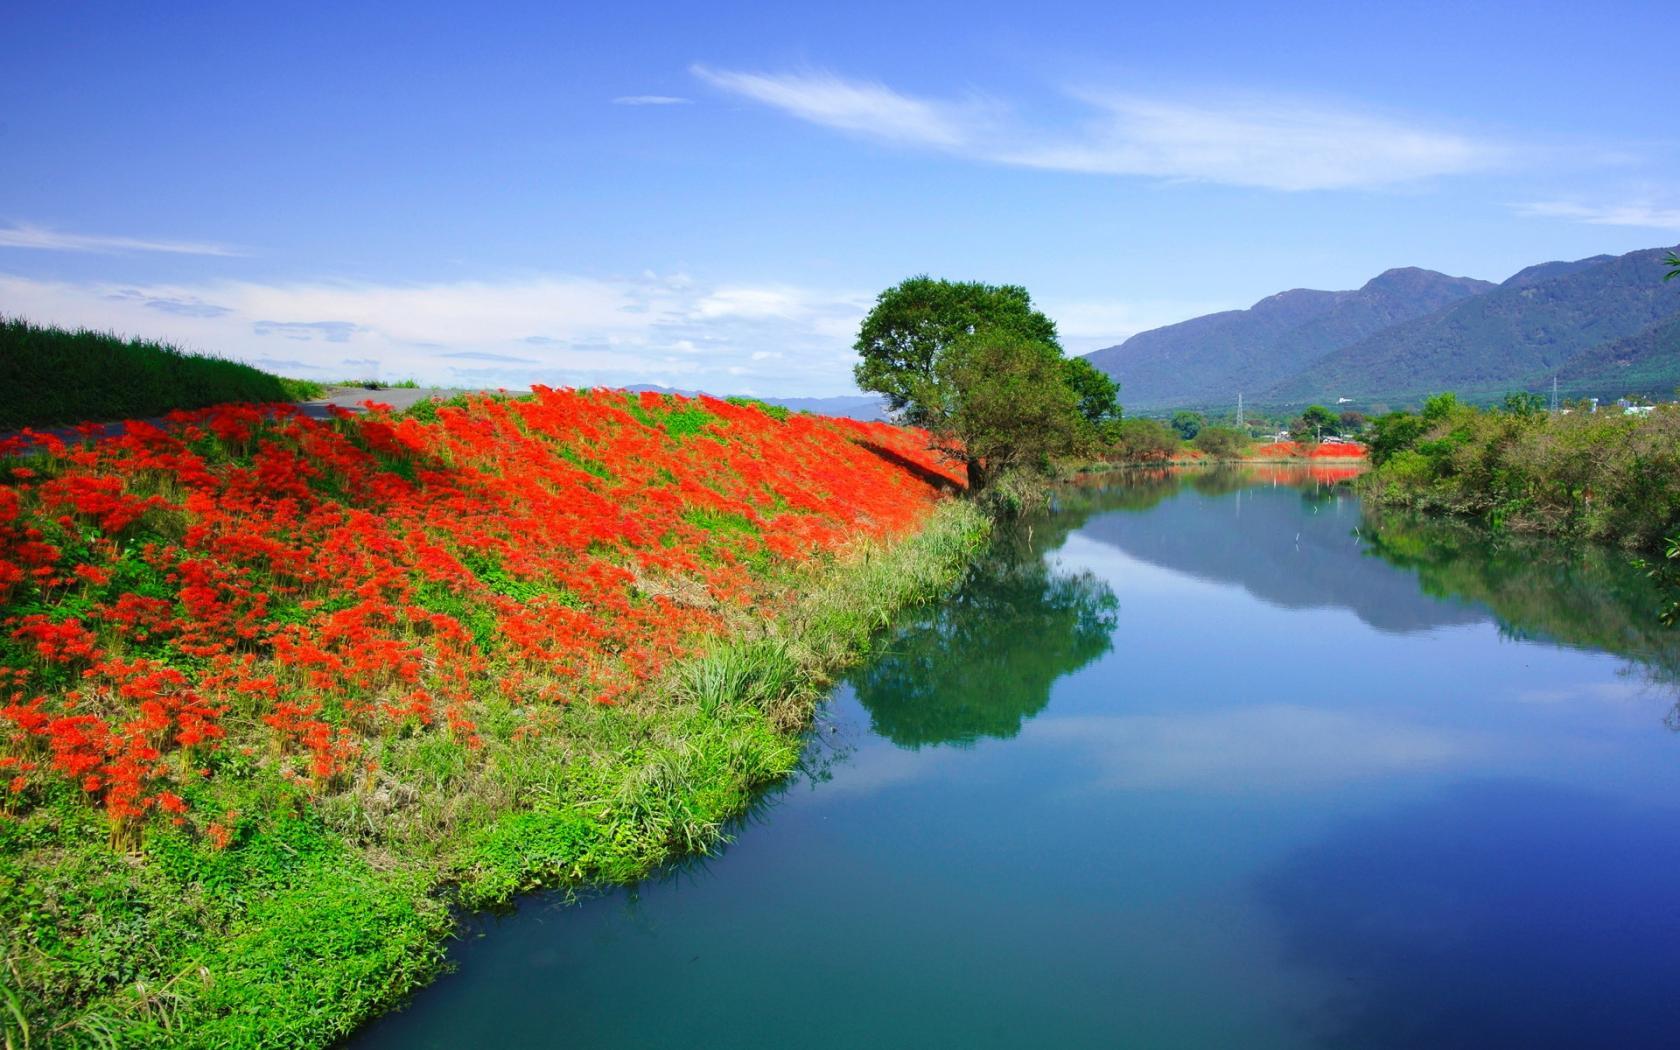 Красота тишина красивые картинки